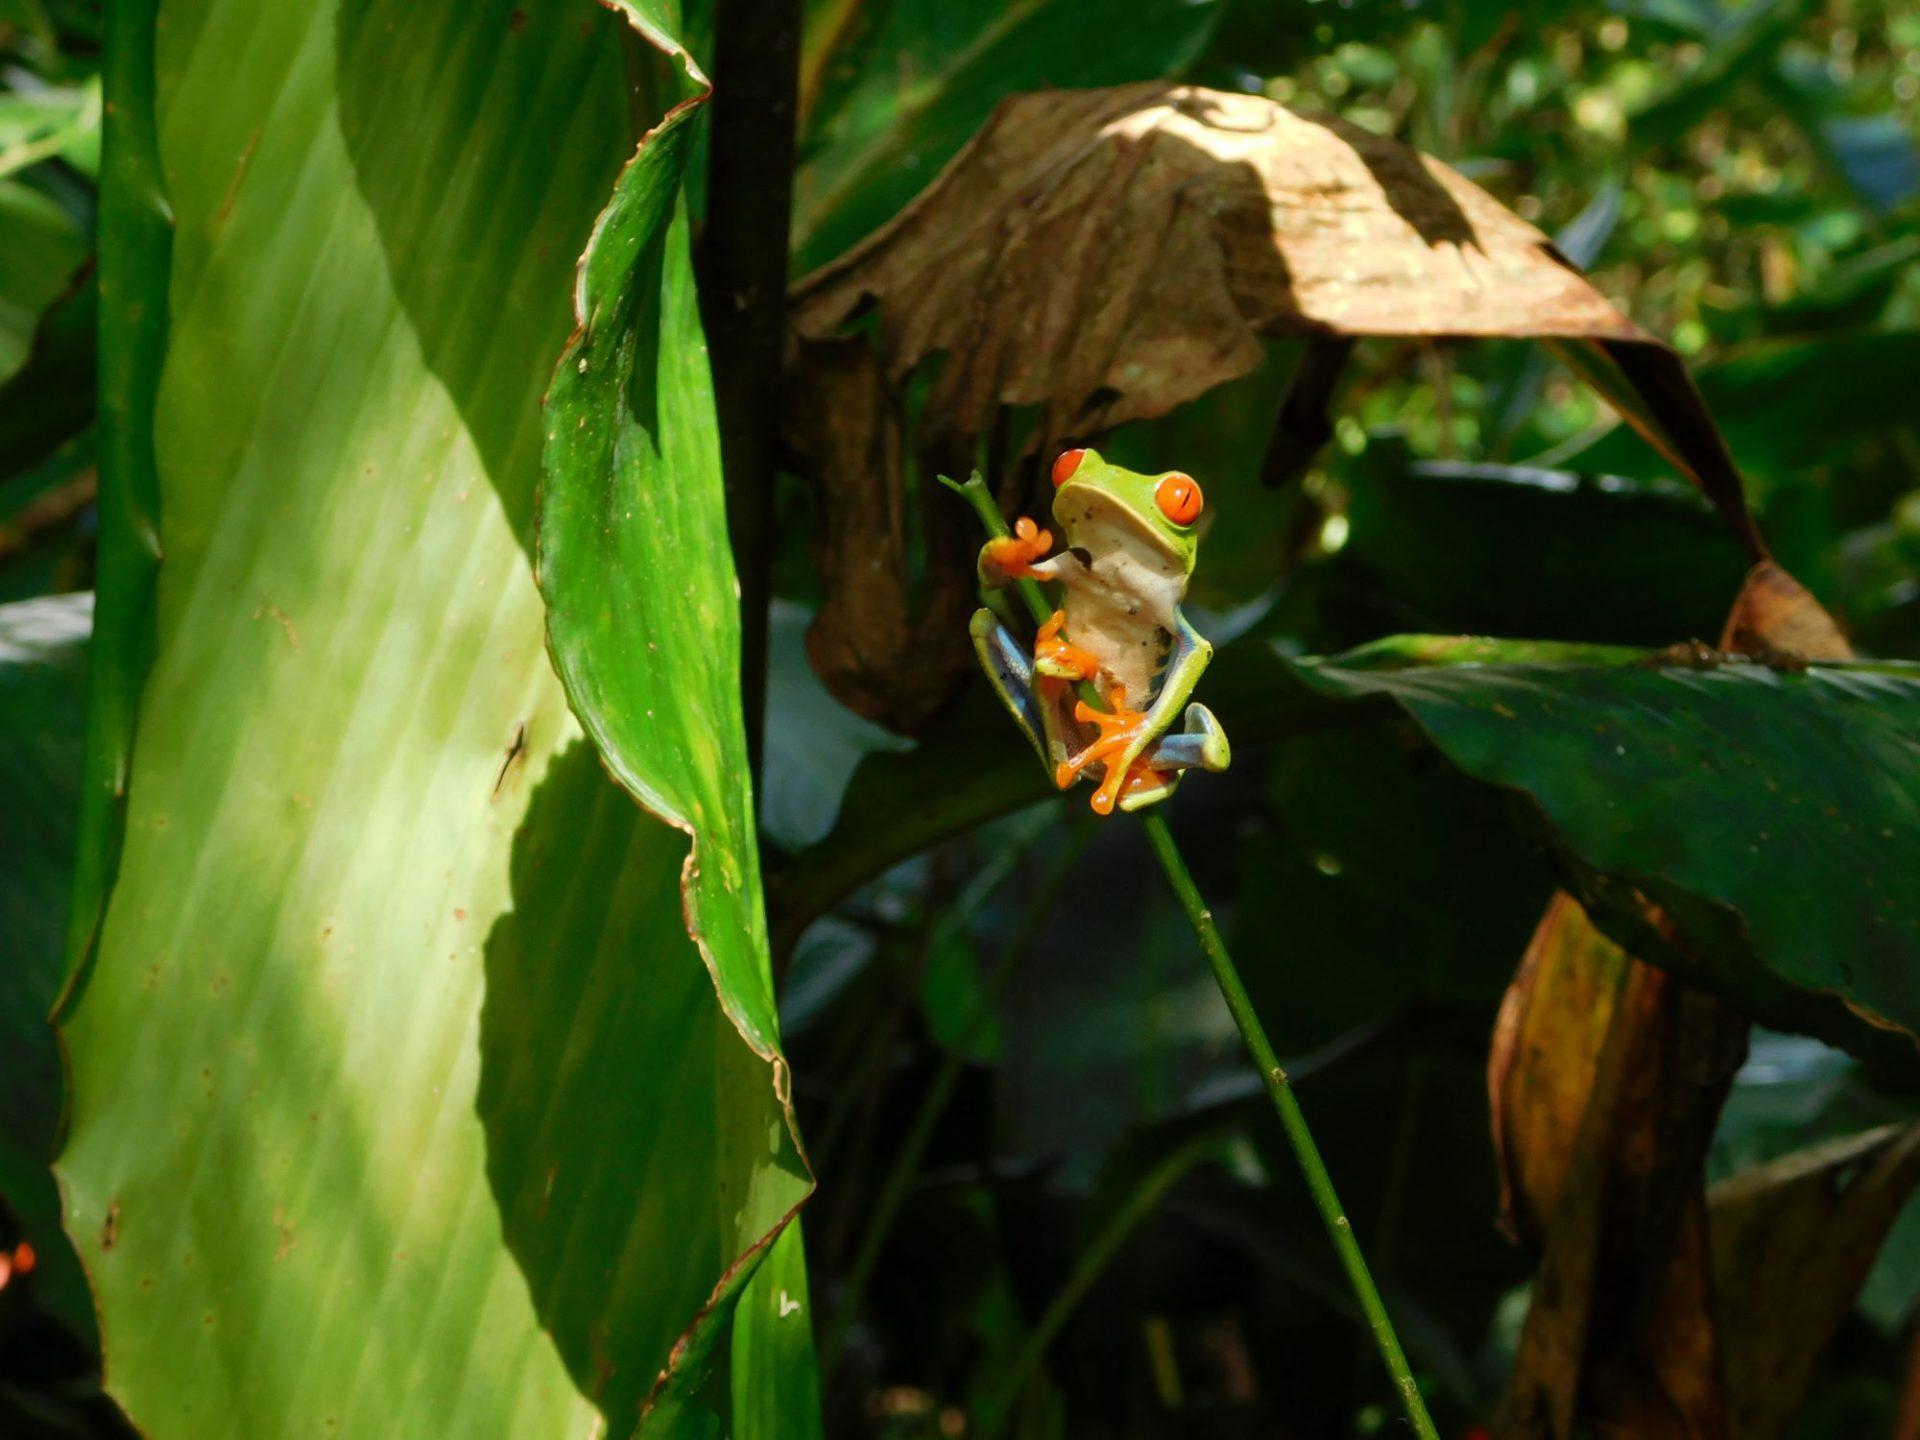 wp-content/uploads/itineraries/Costa-Rica/CRWildlifeDay8.jpg